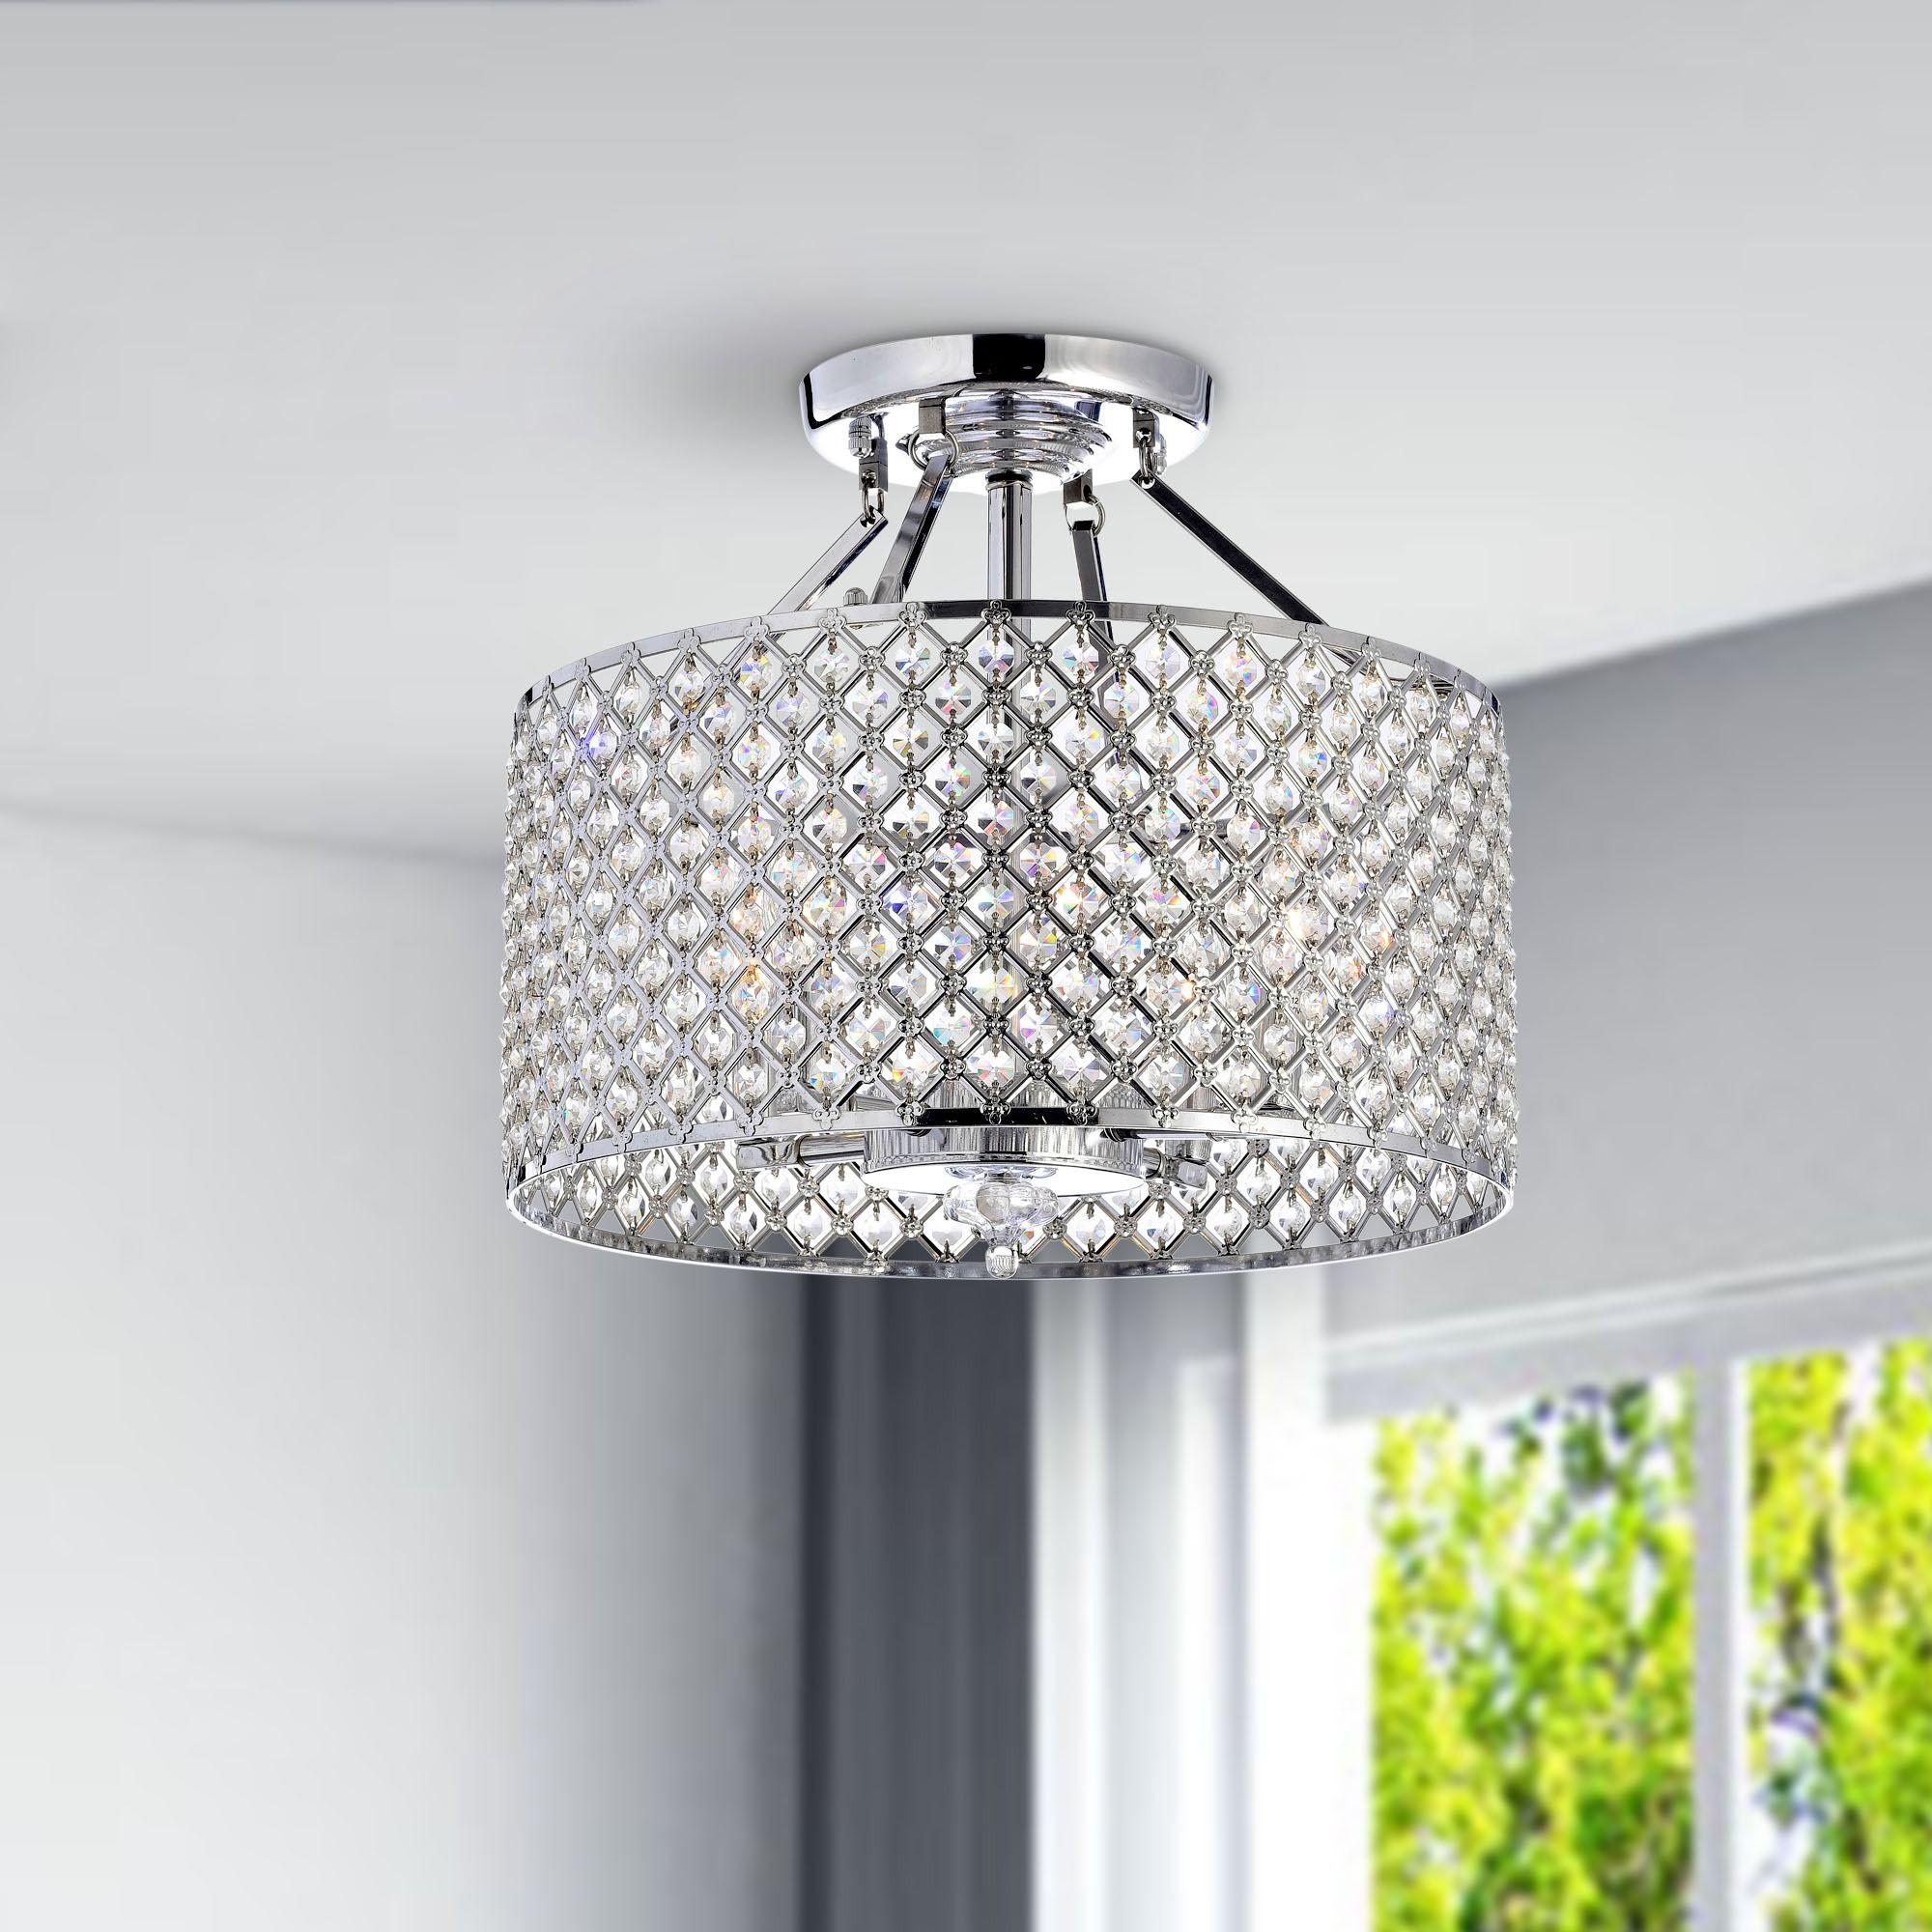 Chrome crystal light round ceiling chandelier light round